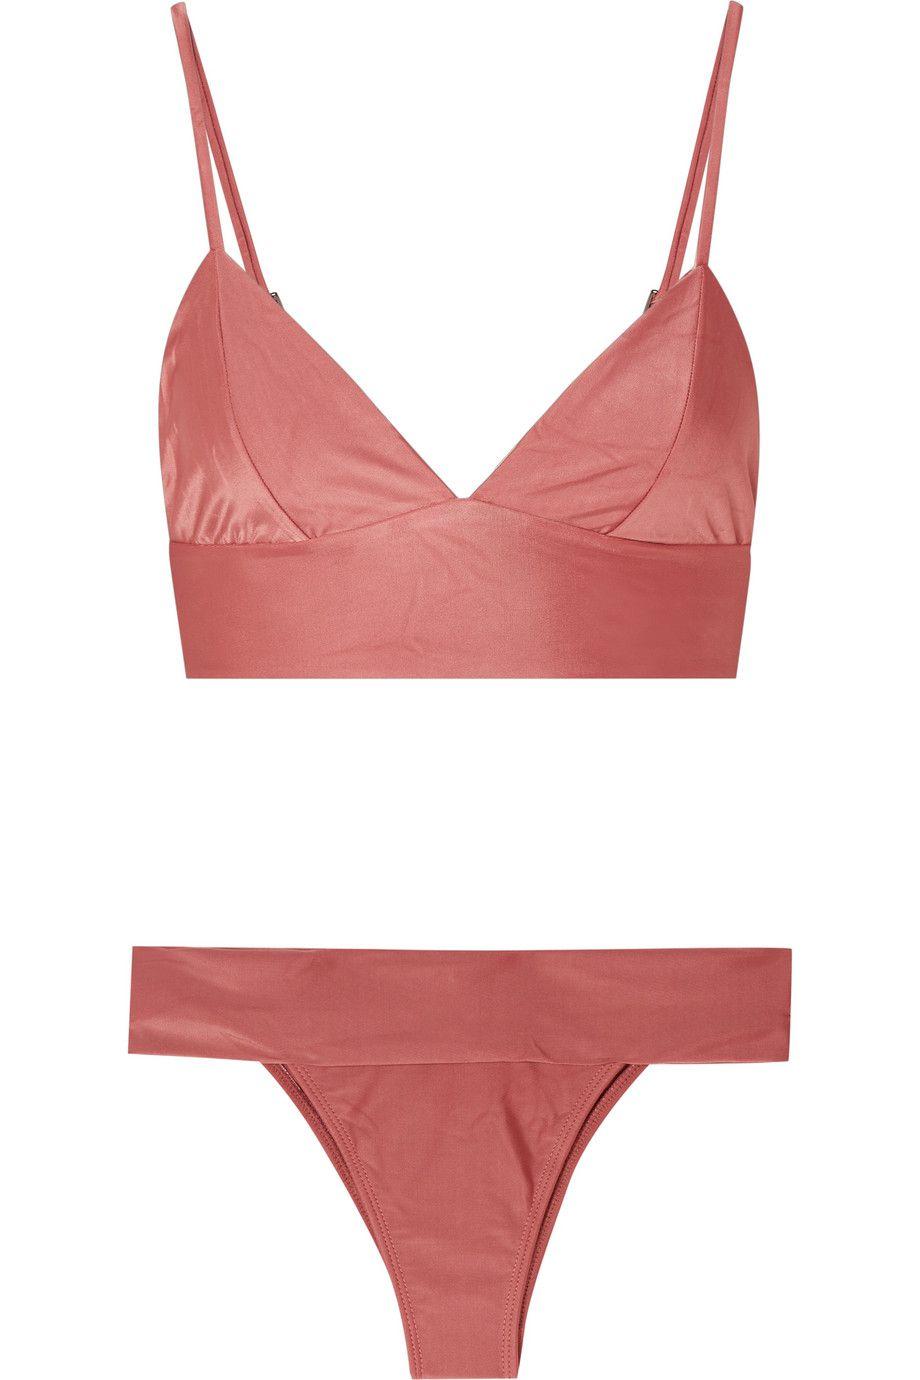 pink bathing suit